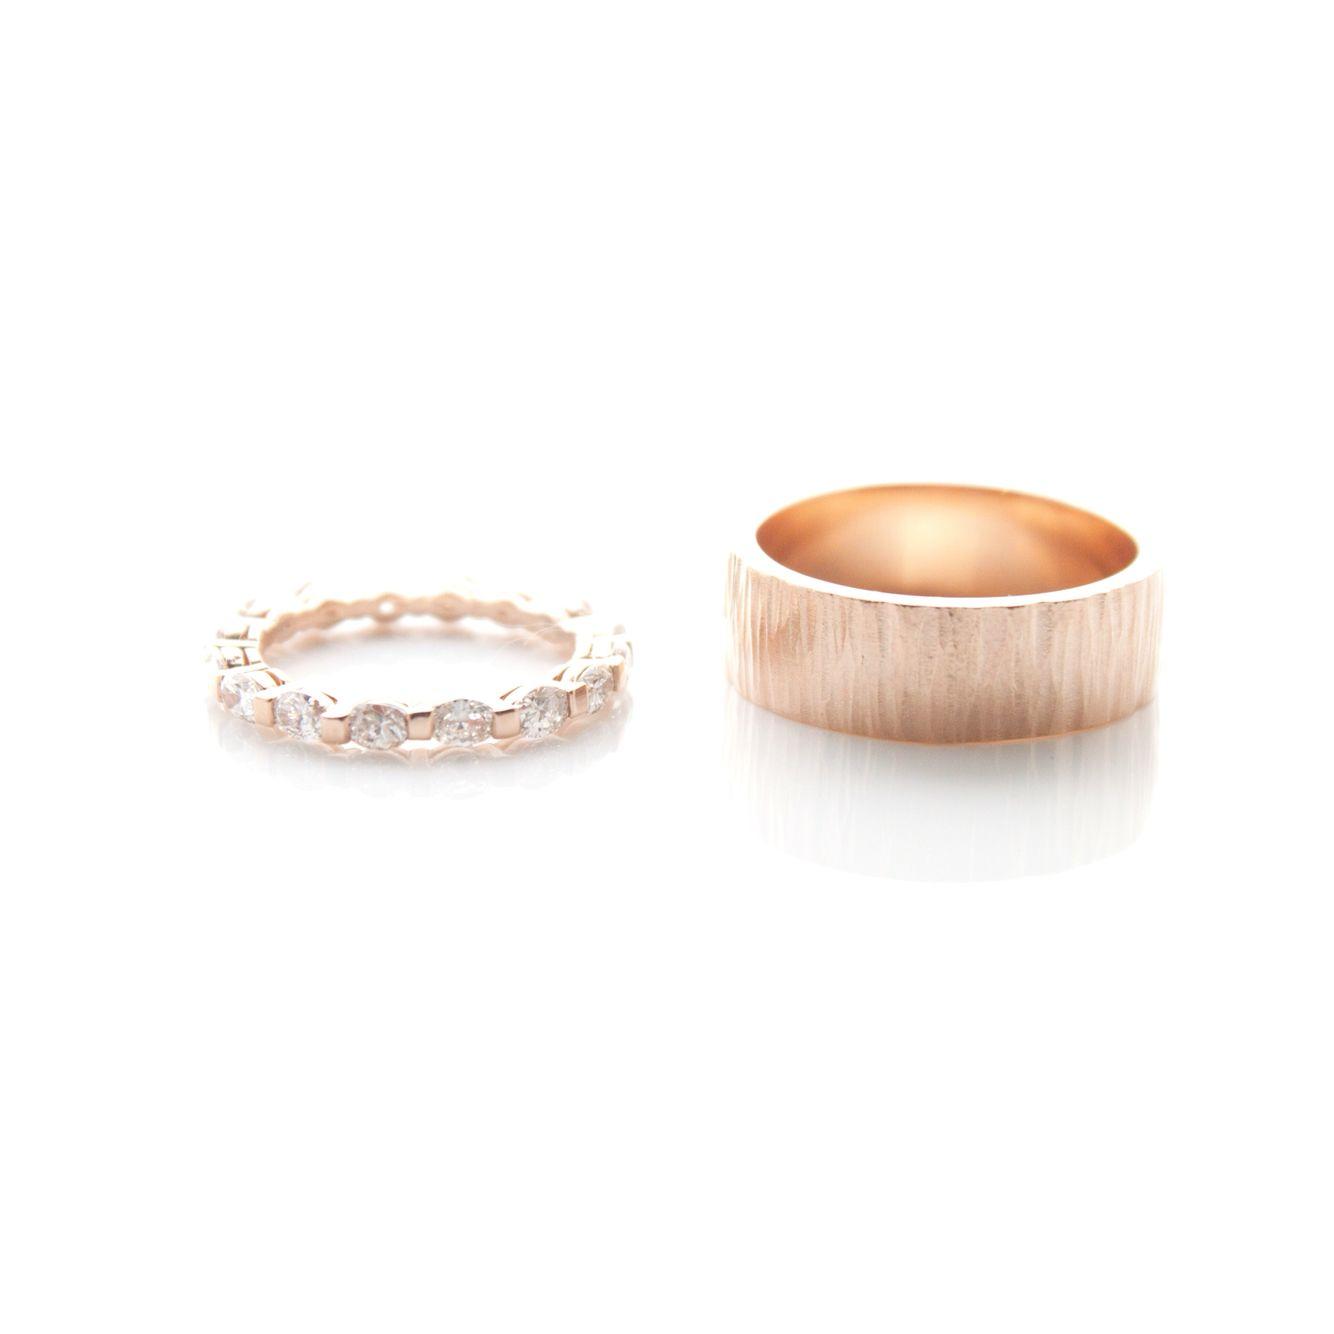 Rose gold bands #WeddingRingWednesday #RoseGoldRings